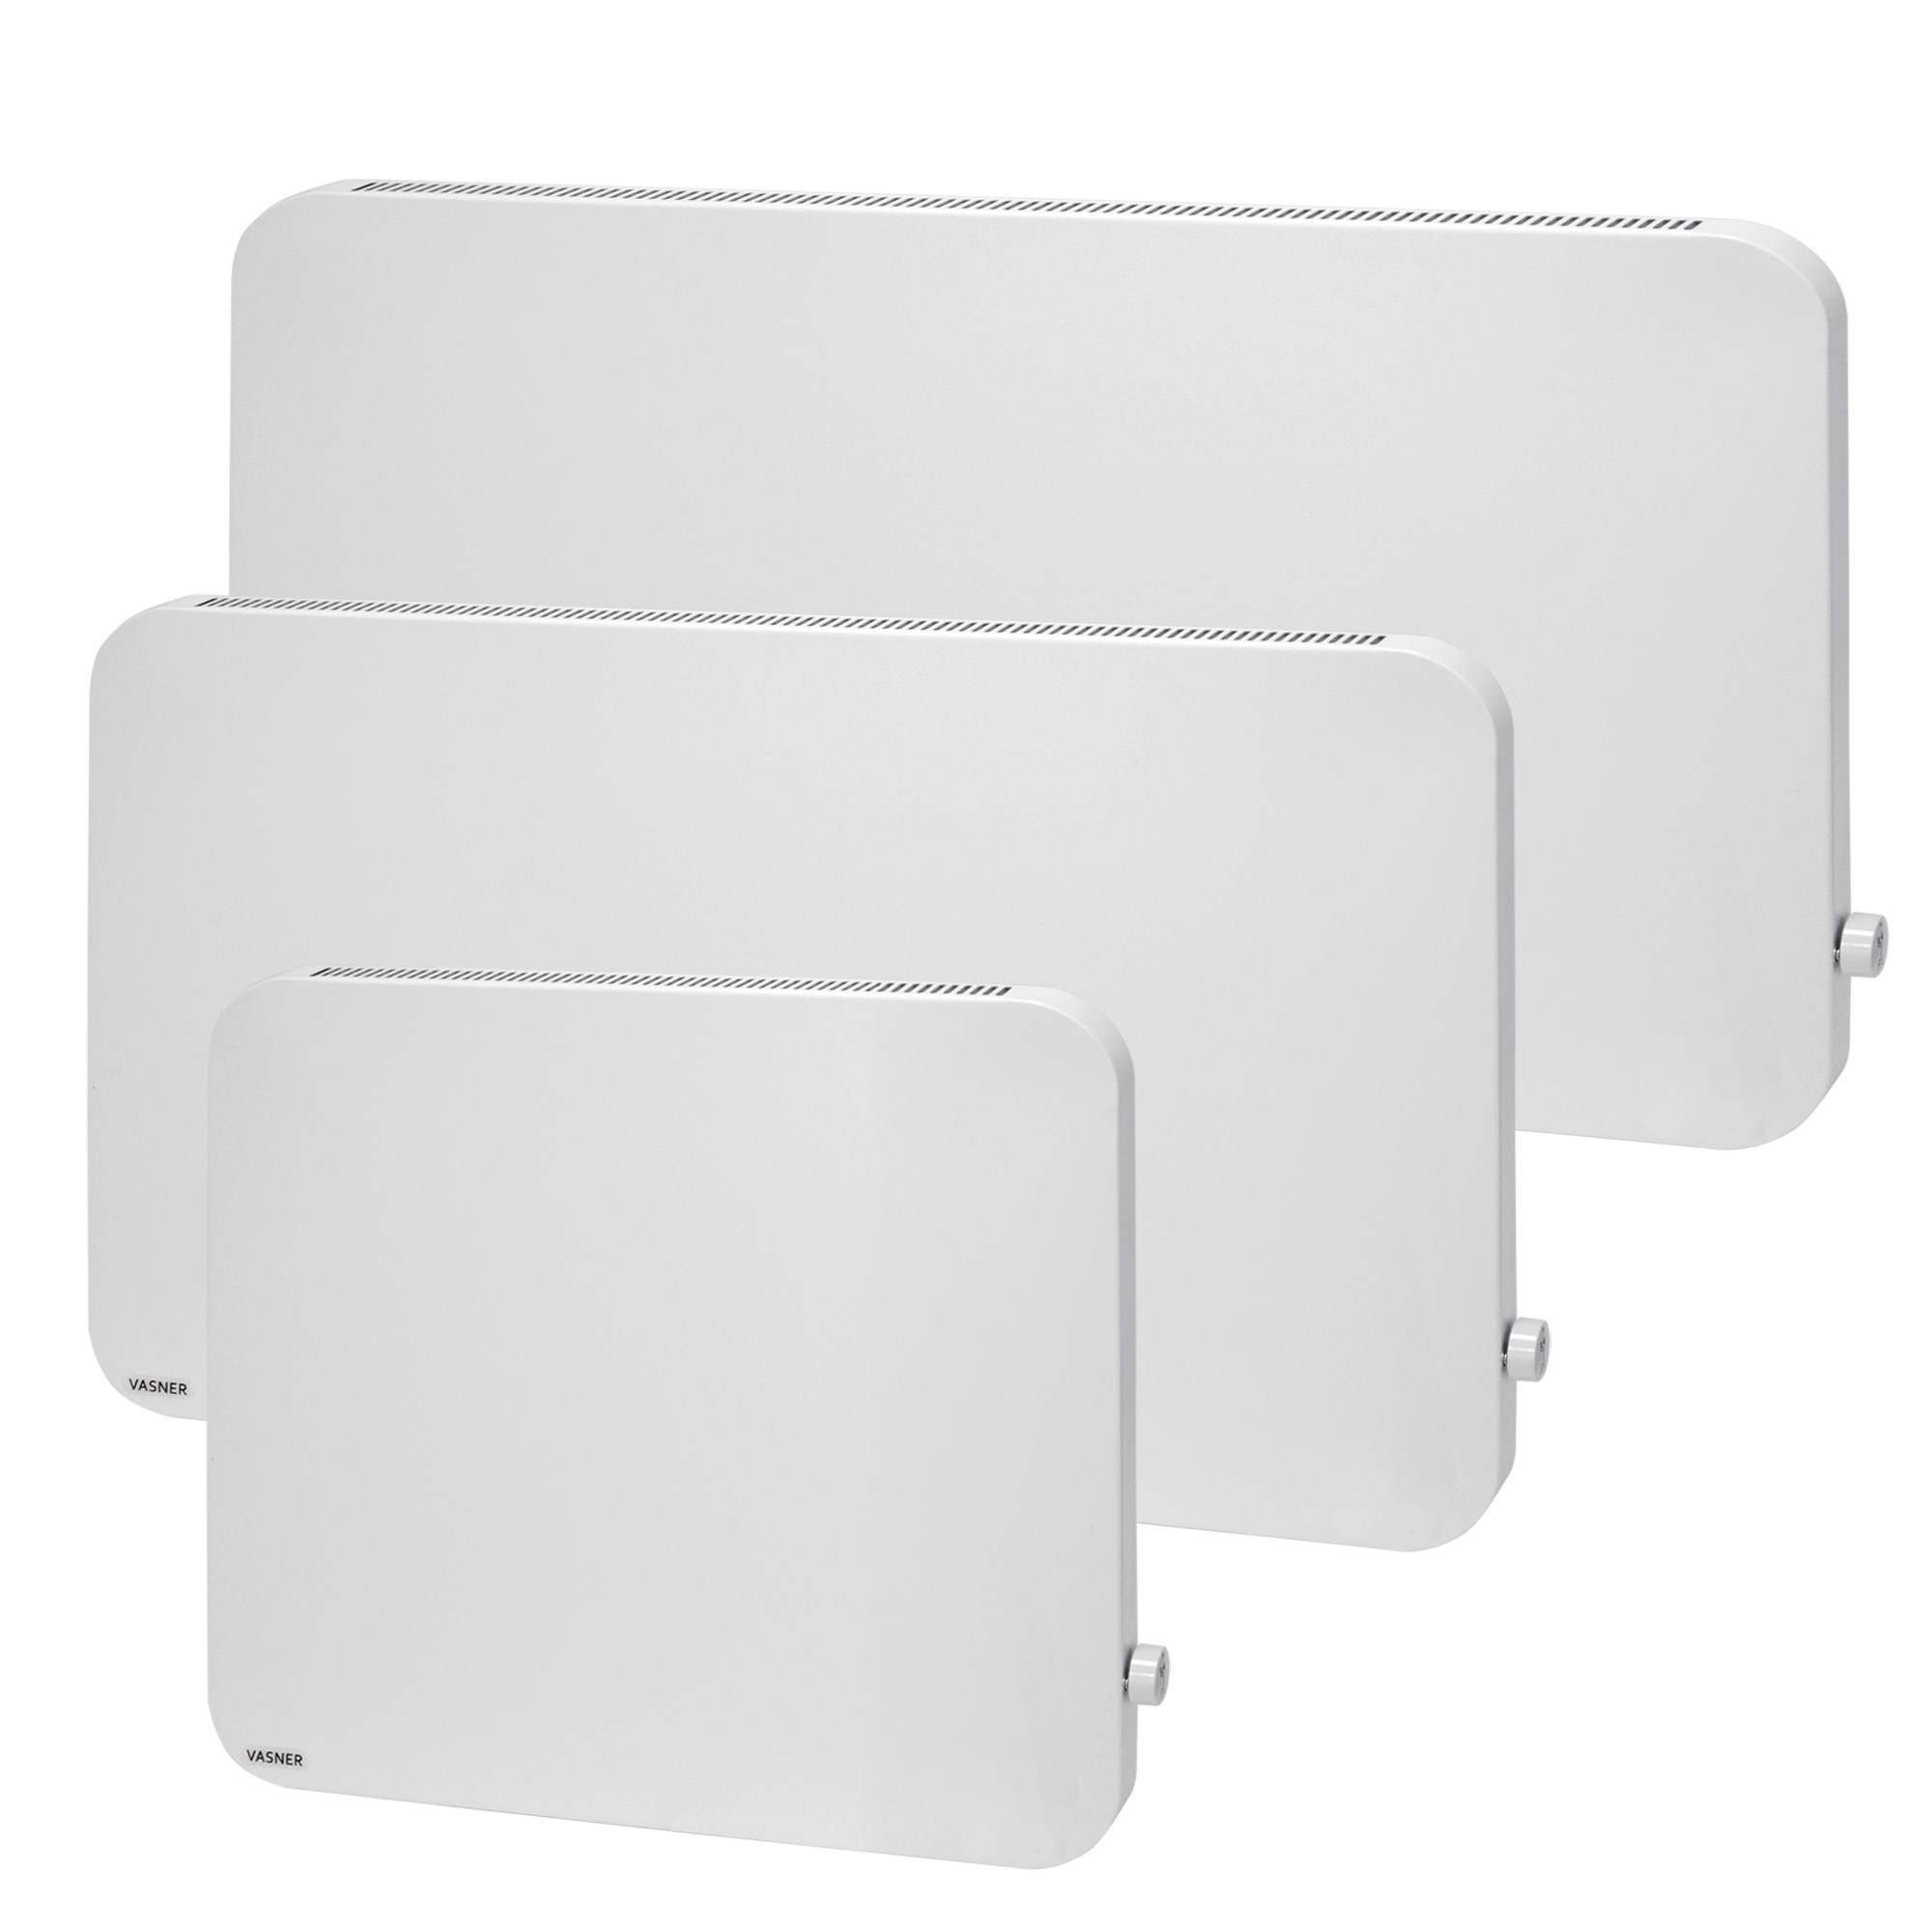 VASNER Konvi Plus runde Hybrid Infrarotheizung mit Thermostat